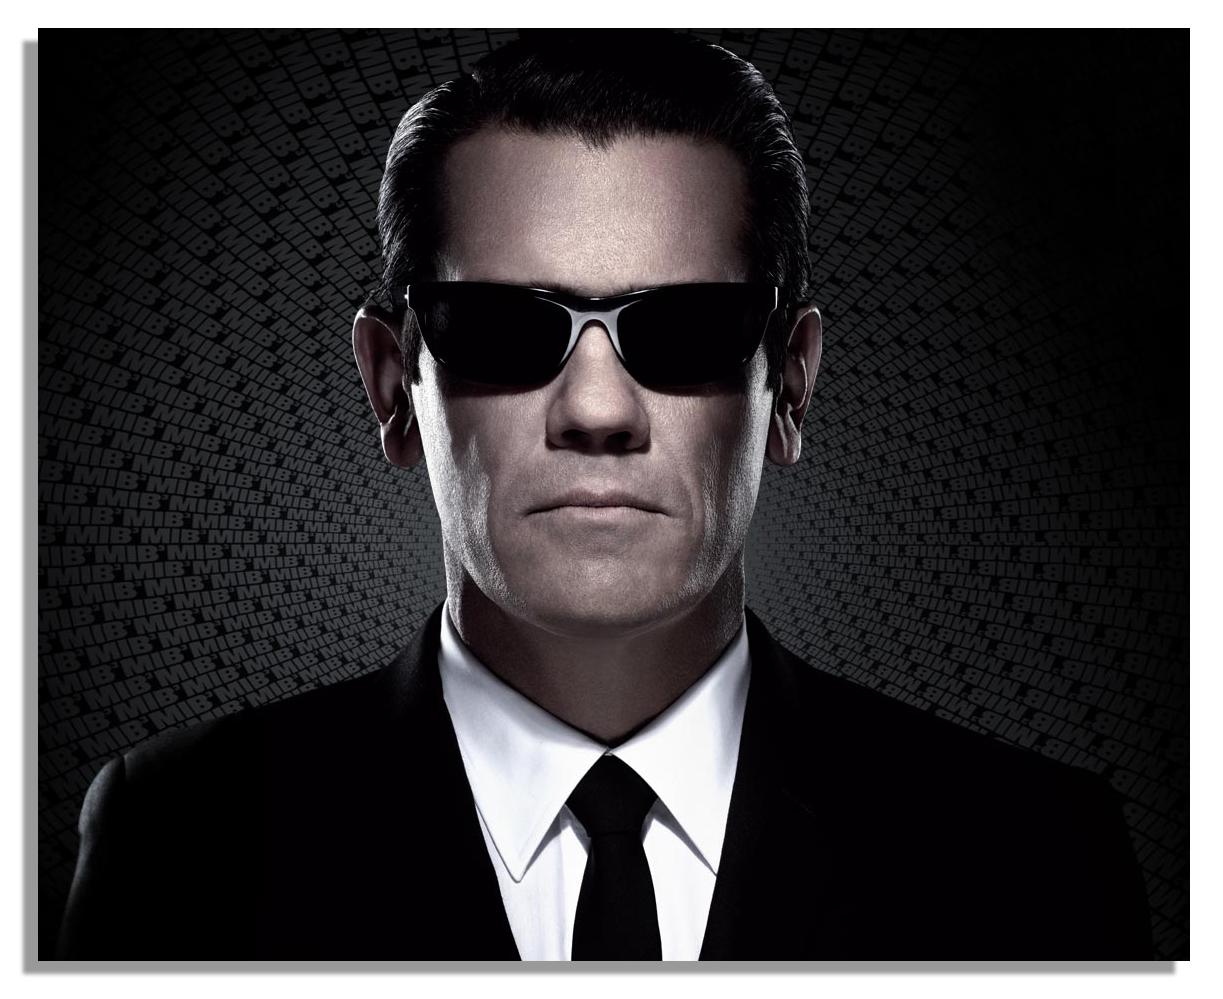 188c91b50e Lot Detail -   Men in Black 3   Ray Ban Sunglasses Used by Josh Brolin